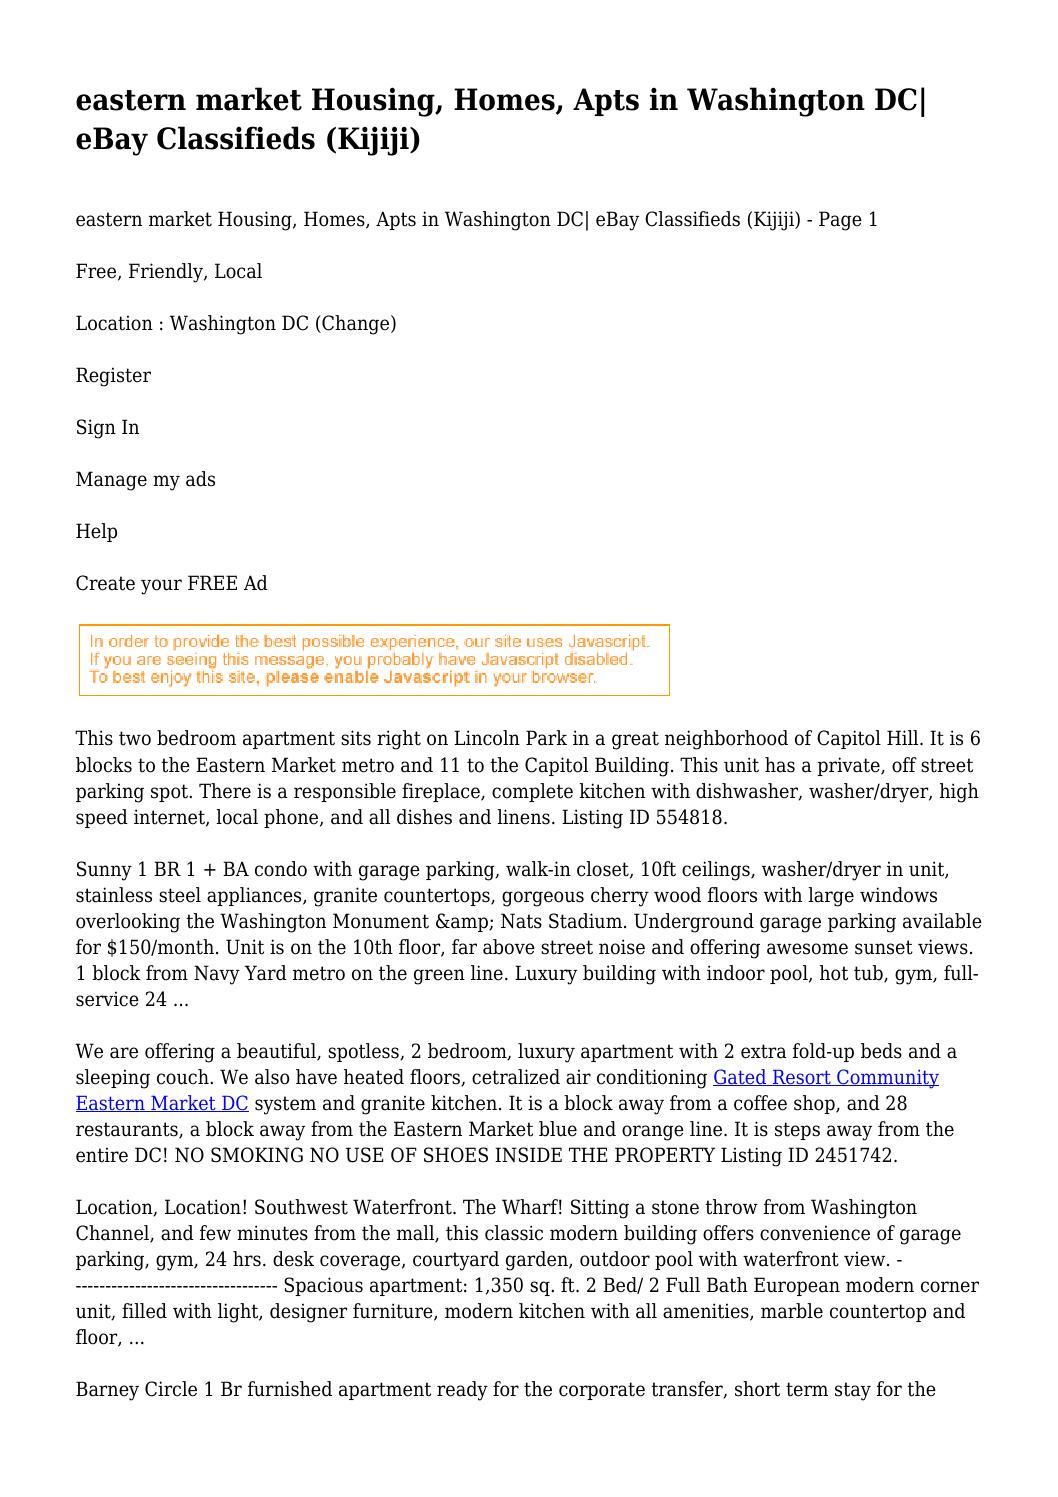 Eastern Market Housing Homes Apts In Washington Dc Ebay Classifieds Kijiji By Tightfistedbunc48 Issuu